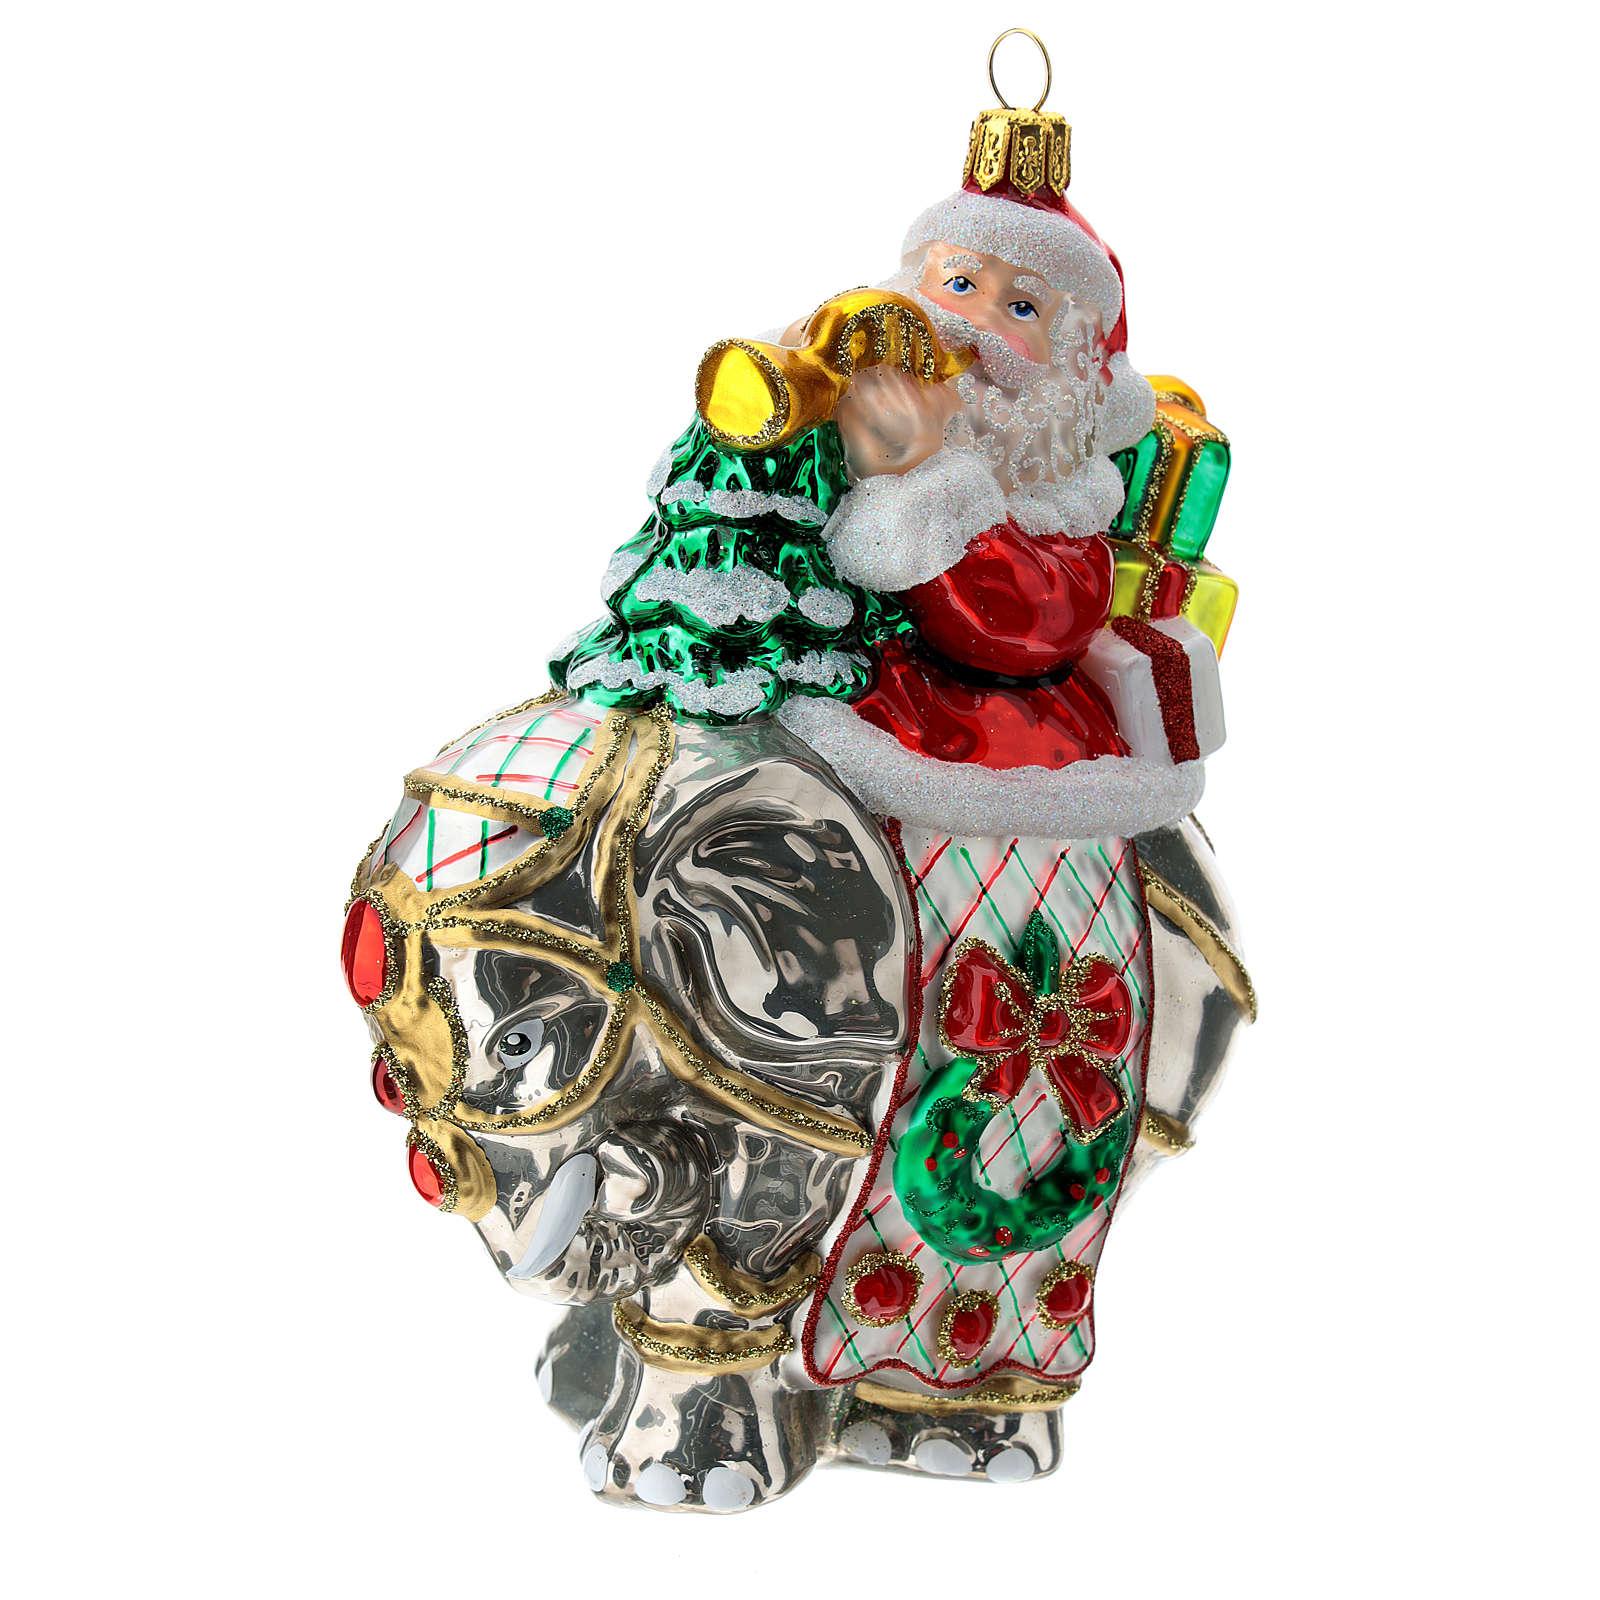 Blown glass Christmas ornament, Santa Claus on elephant 4